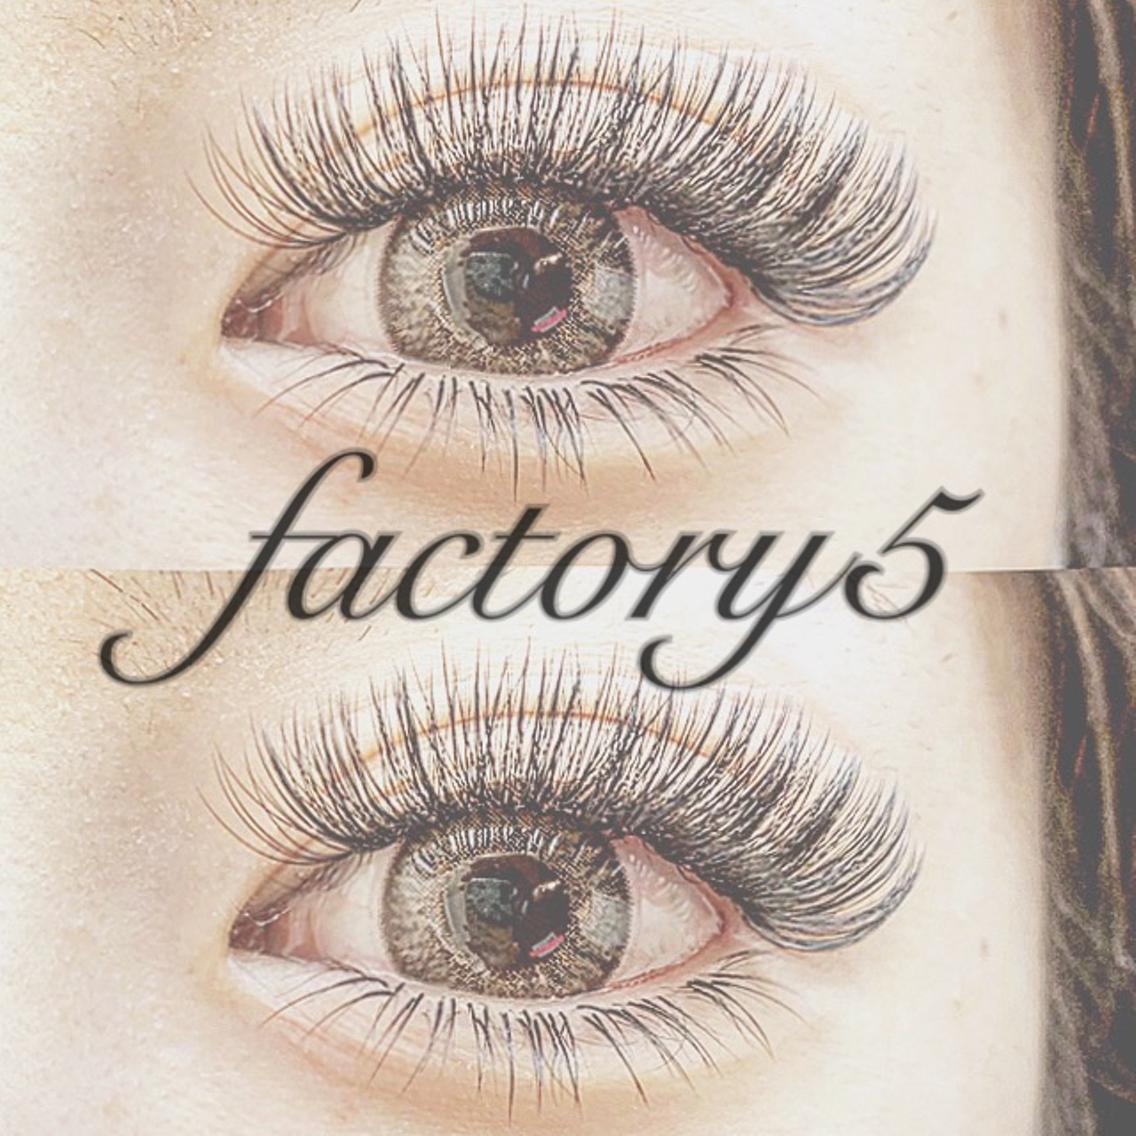 Factory5所属・Factory 5の掲載